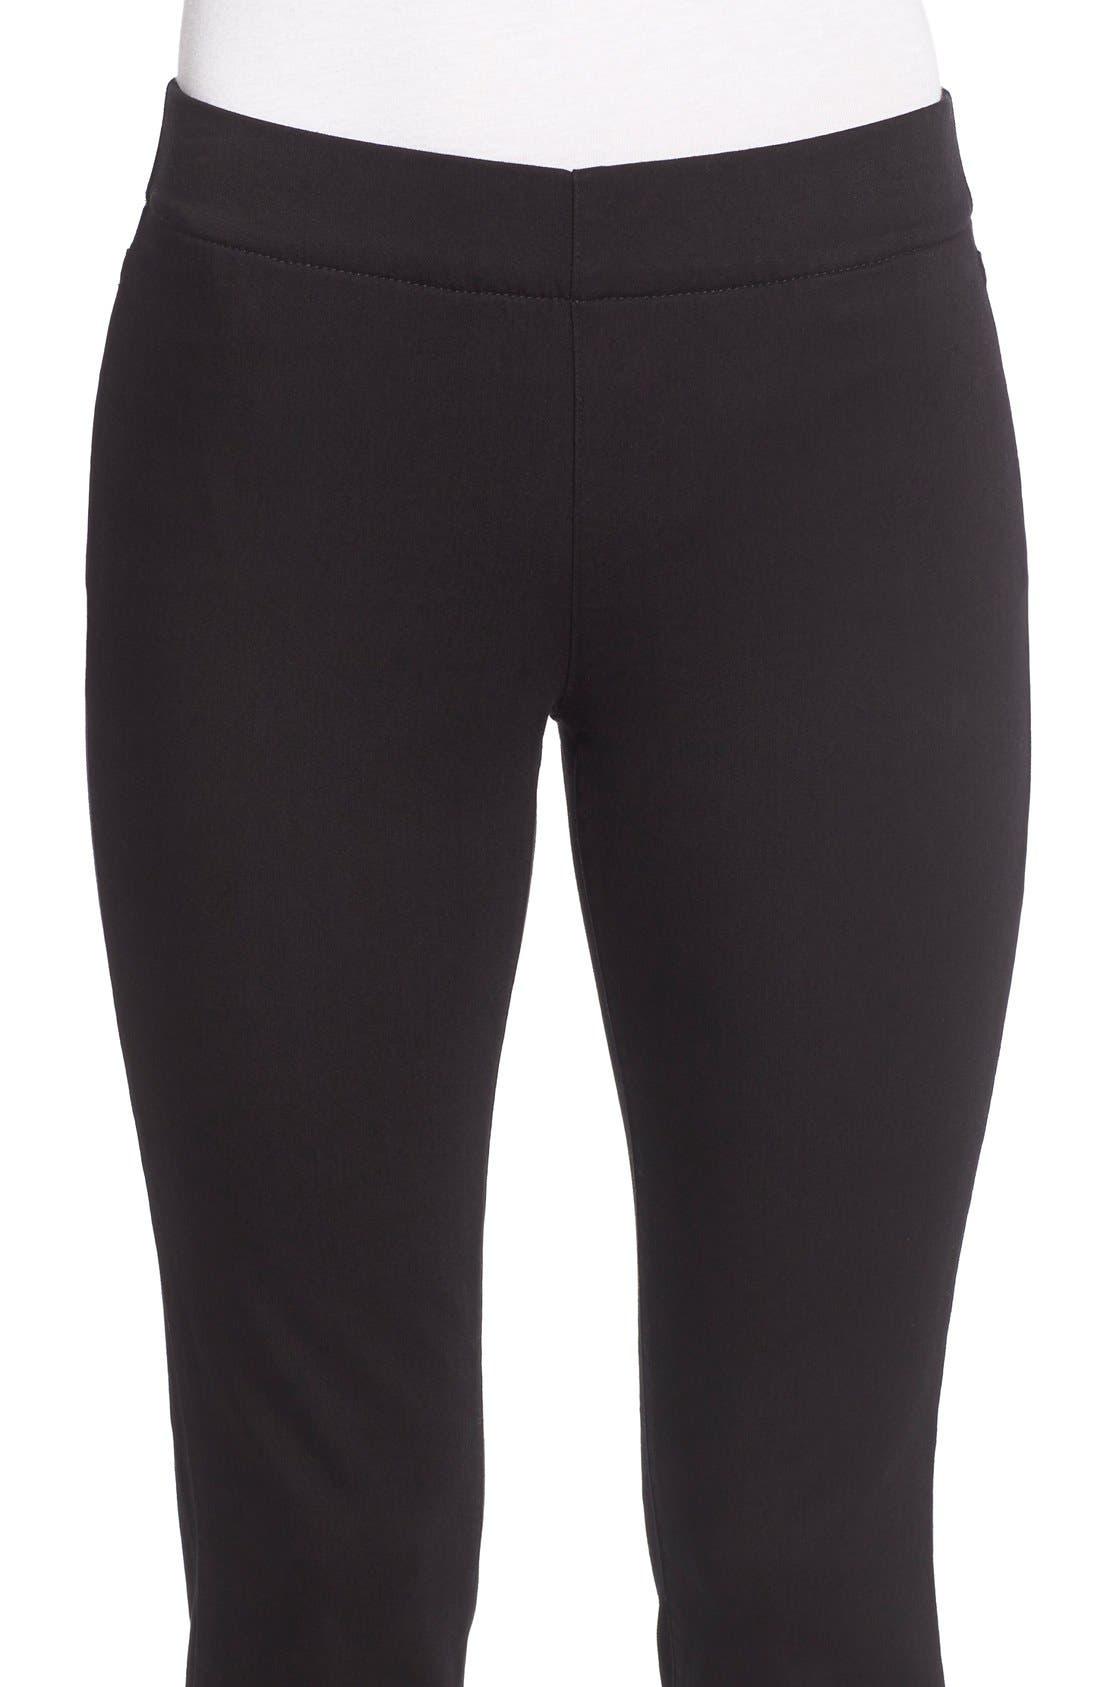 Alternate Image 4  - NYDJ Millie Pull-On Stretch Ankle Skinny Jeans (Regular & Petite)